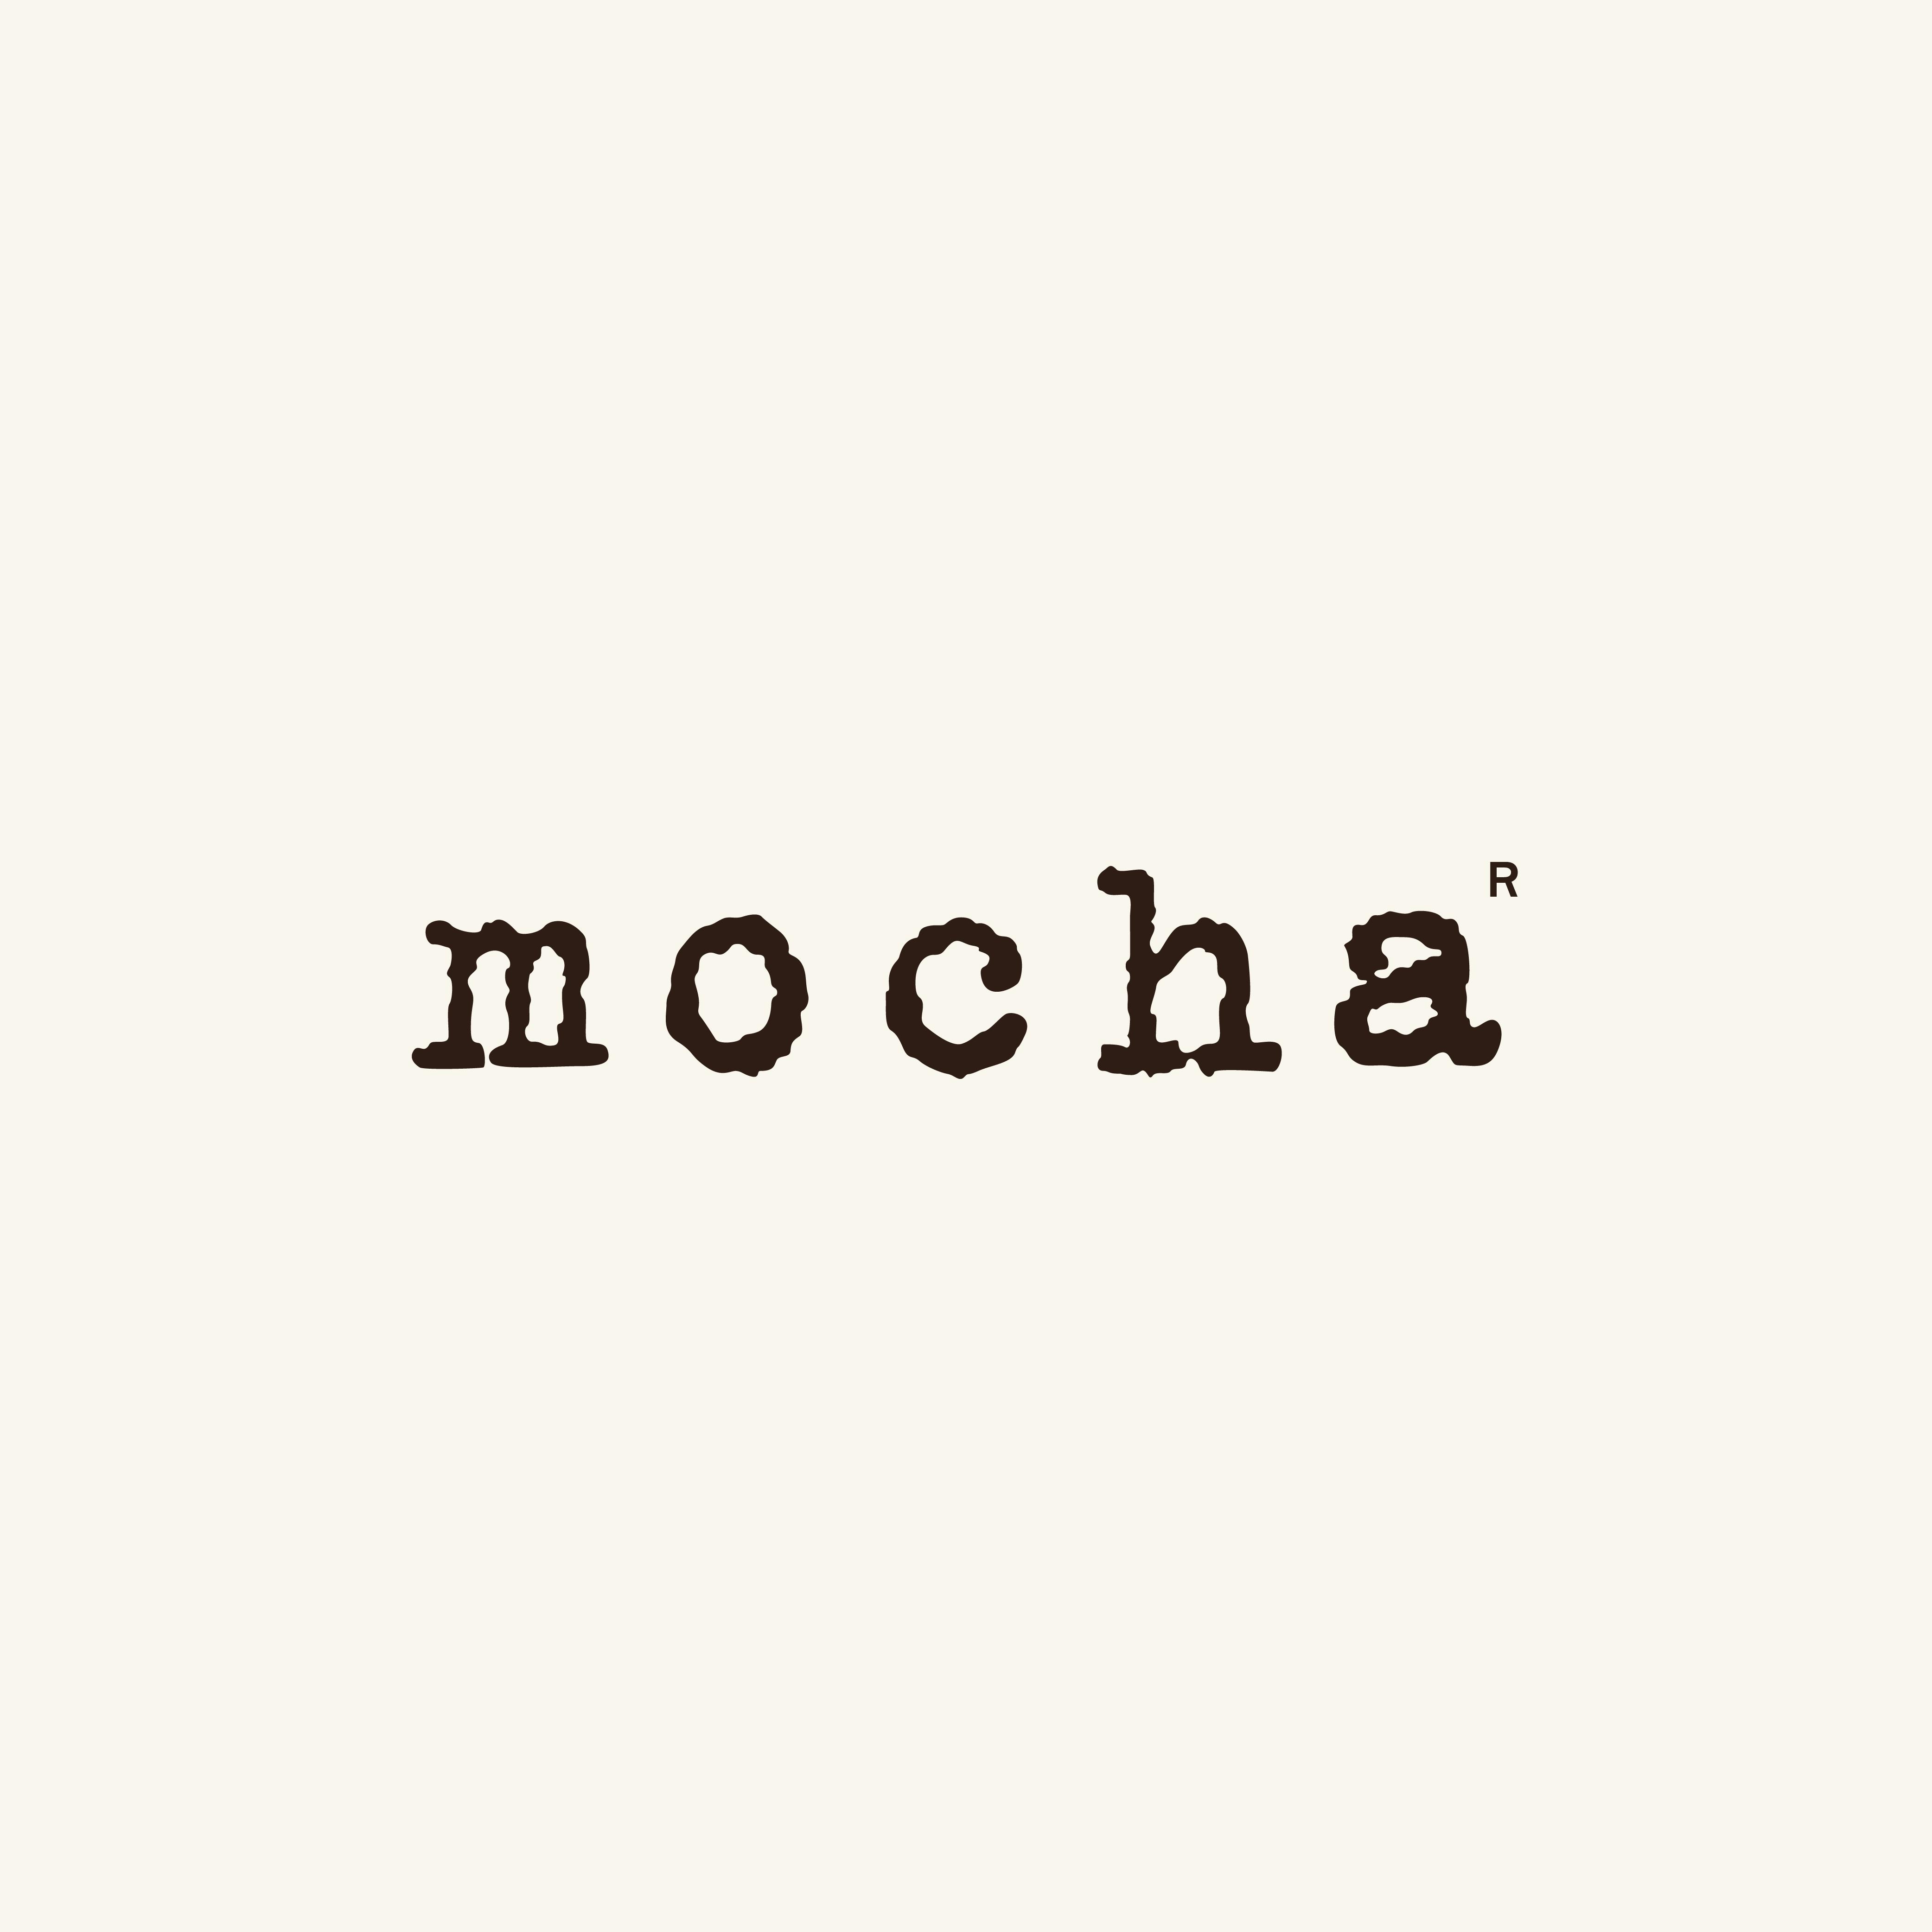 Mocha Image